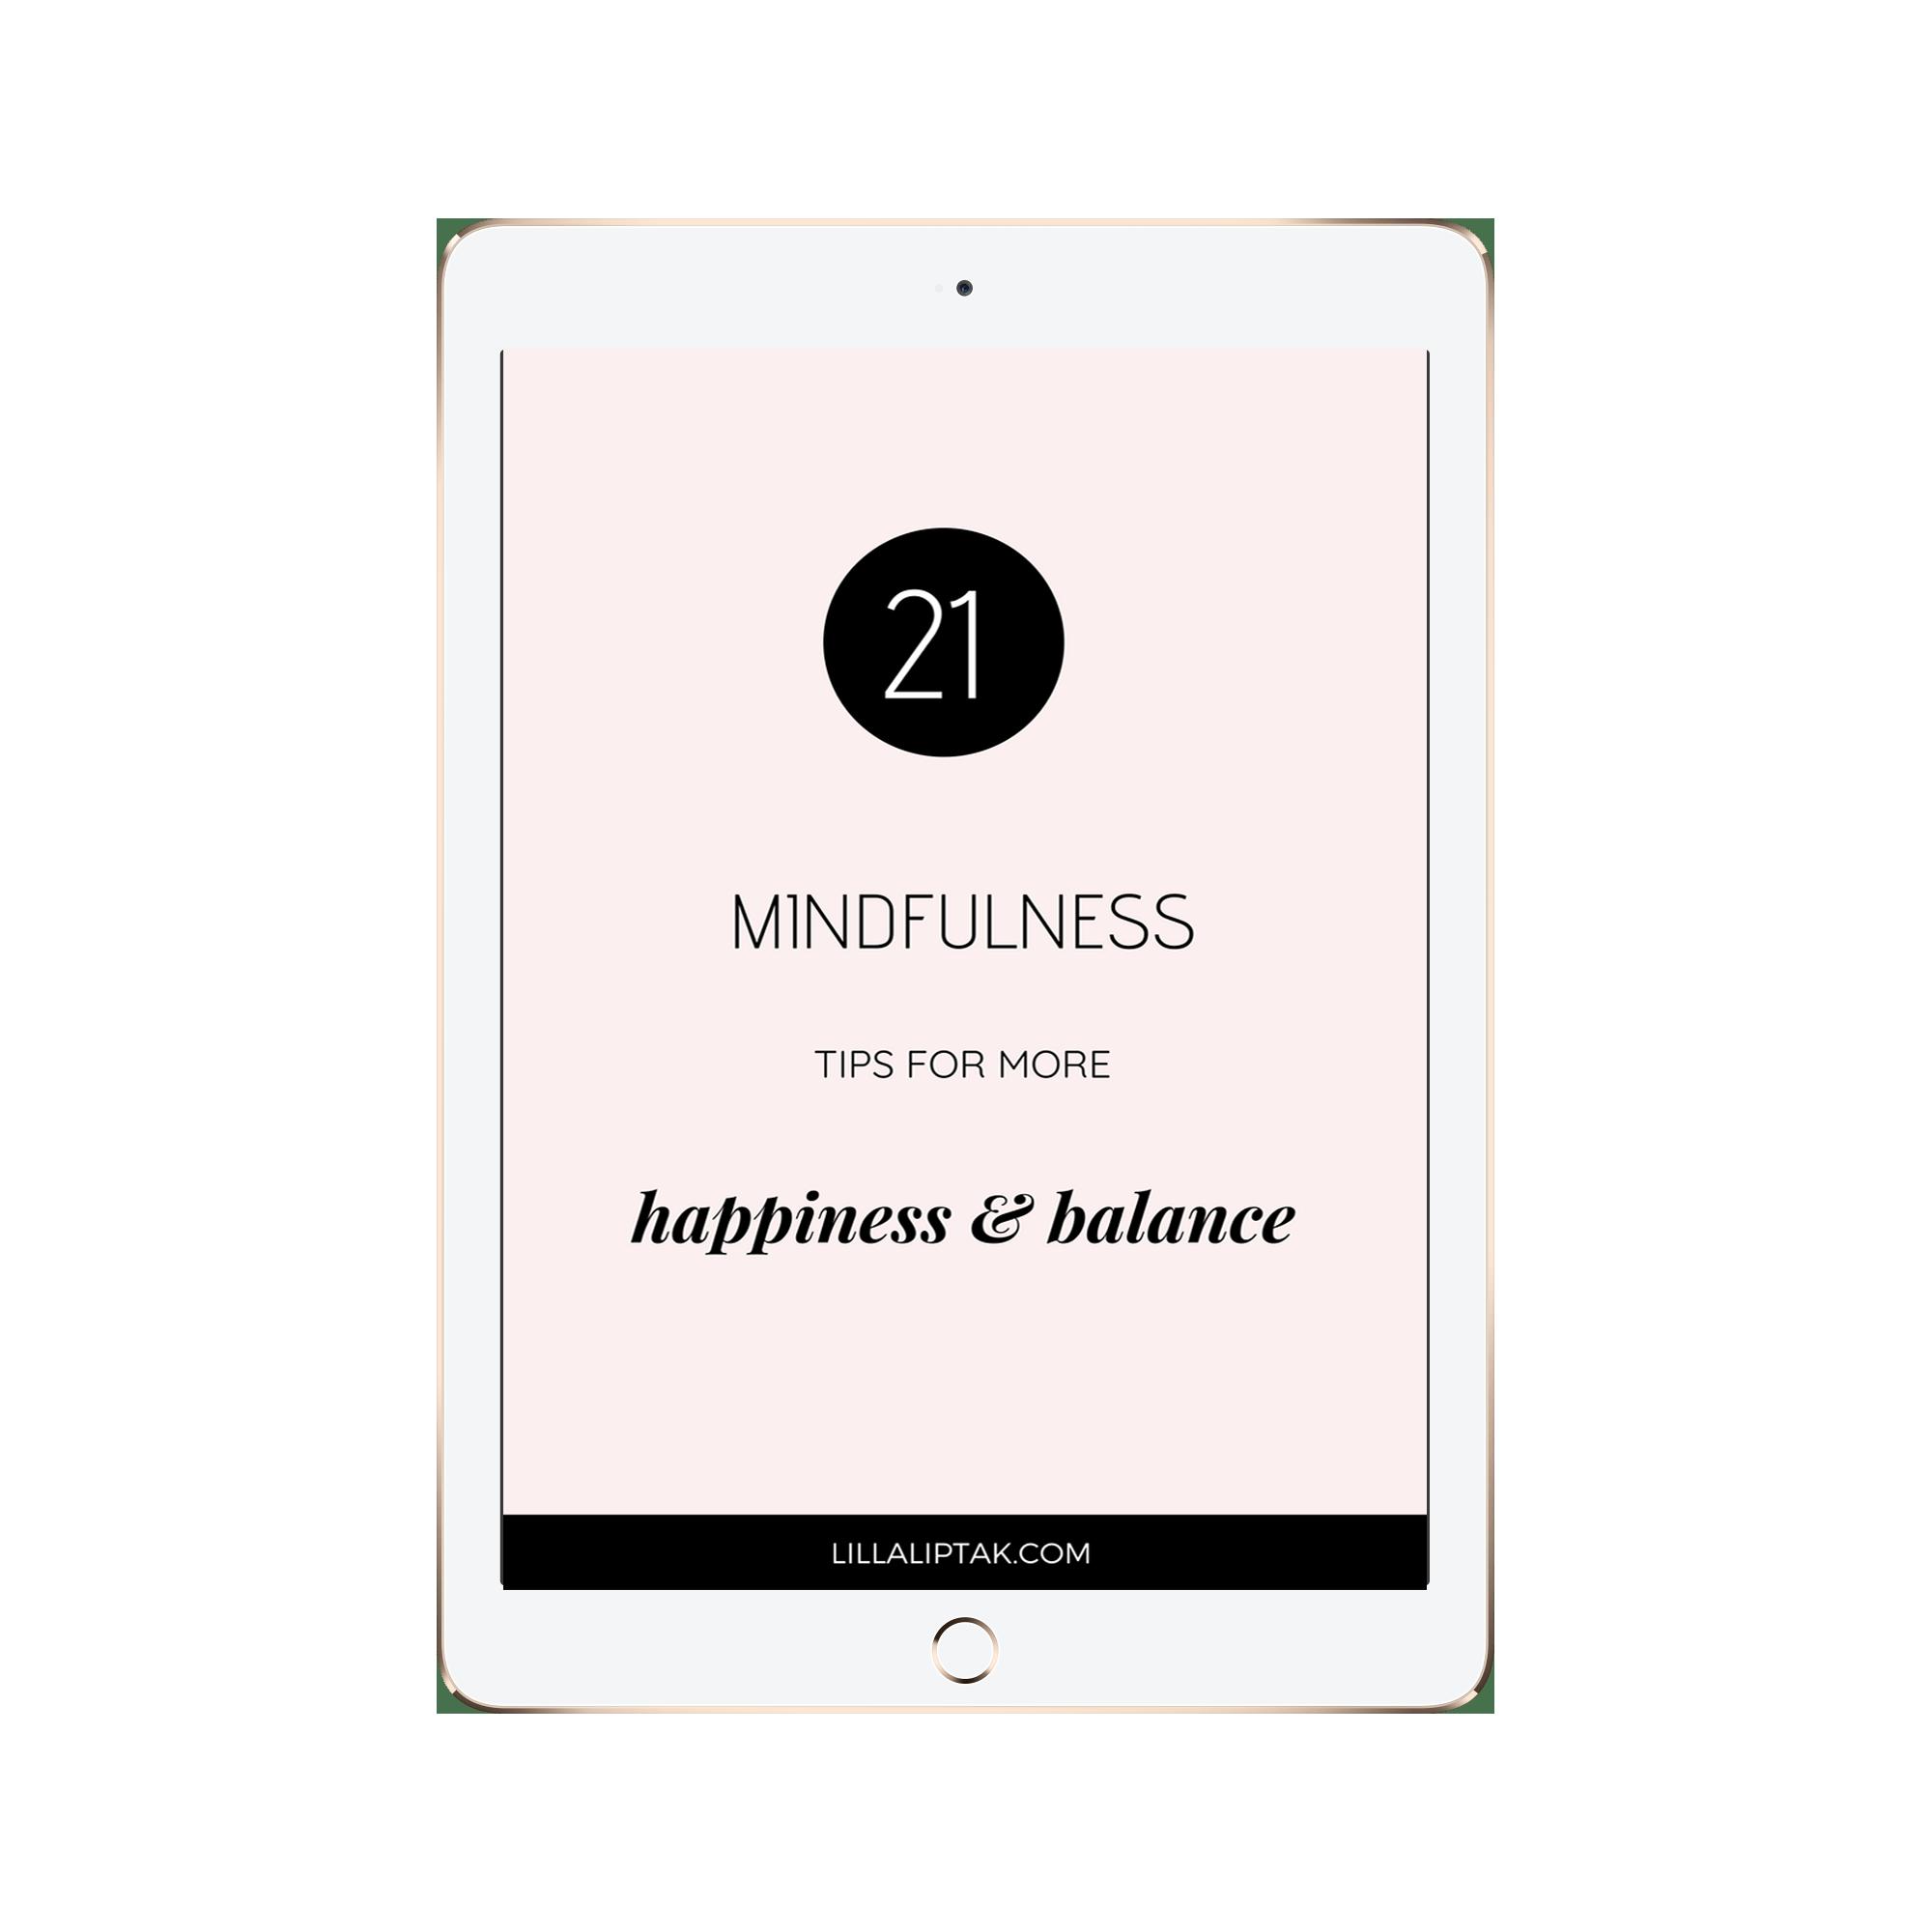 21-MINDFULNESS-TIPS